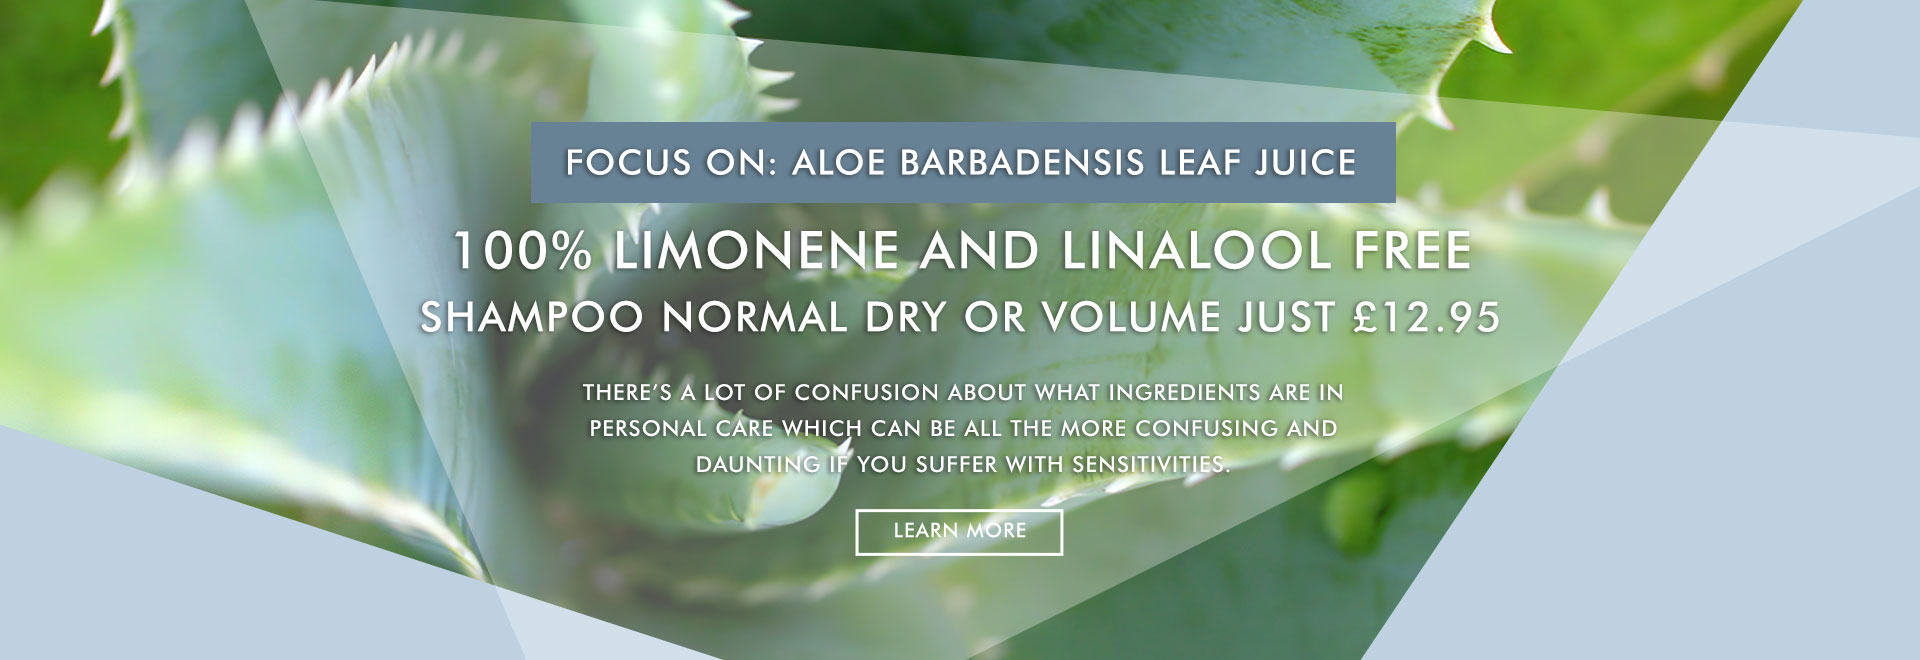 Limonene and Linalool Free Shampoo. Nourished with Aloe Vera.